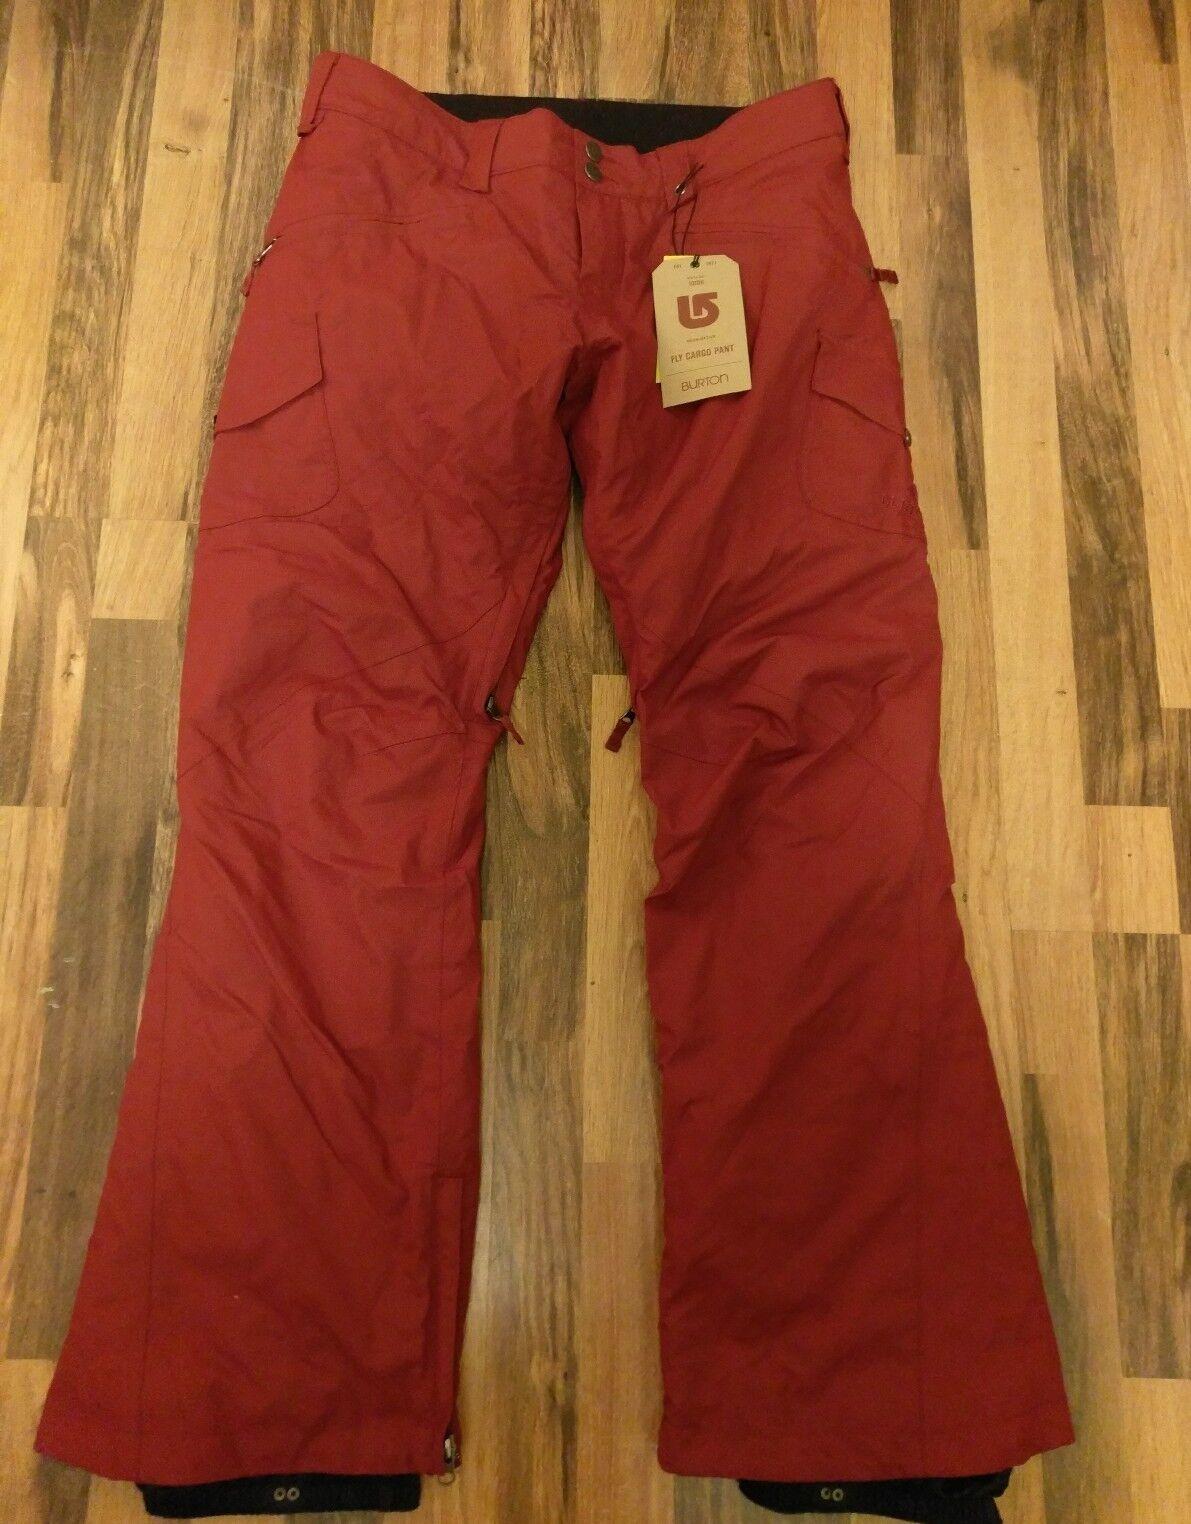 damen snowboard trousers Größe S BURTON, London  B345